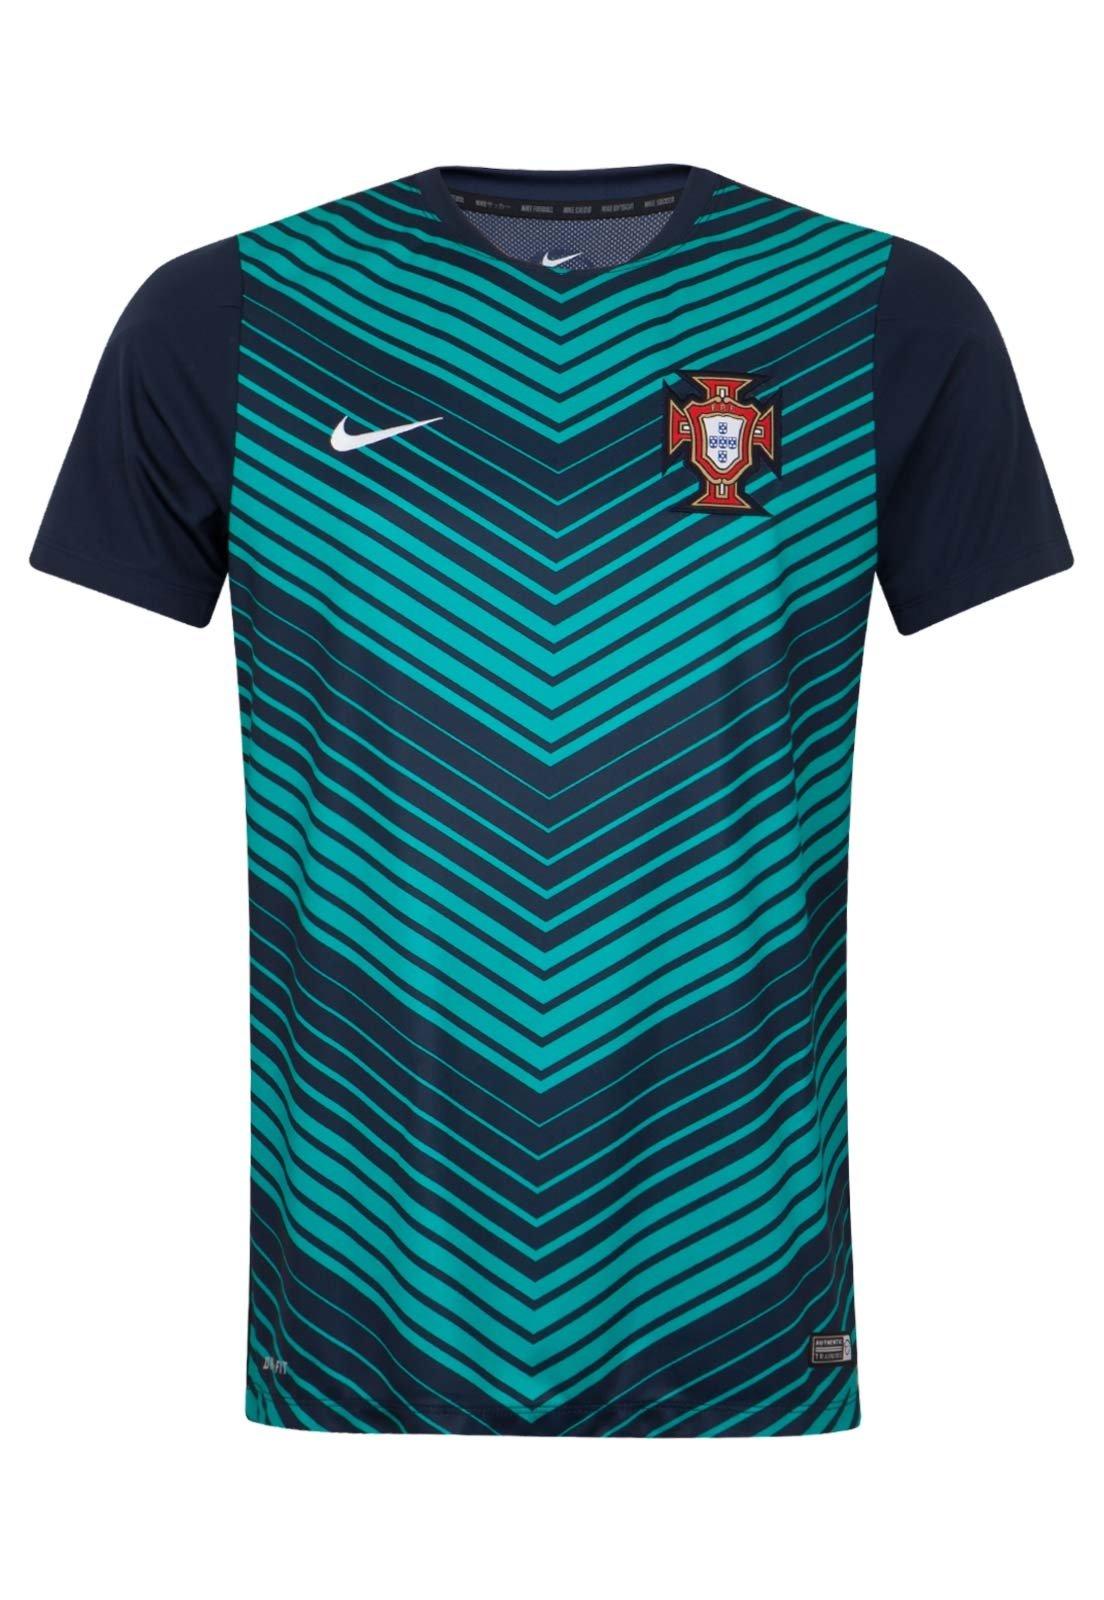 Escrutinio Heredero bobina  Camisa Nike Portugal Treino Azul - Compre Agora | Dafiti Brasil